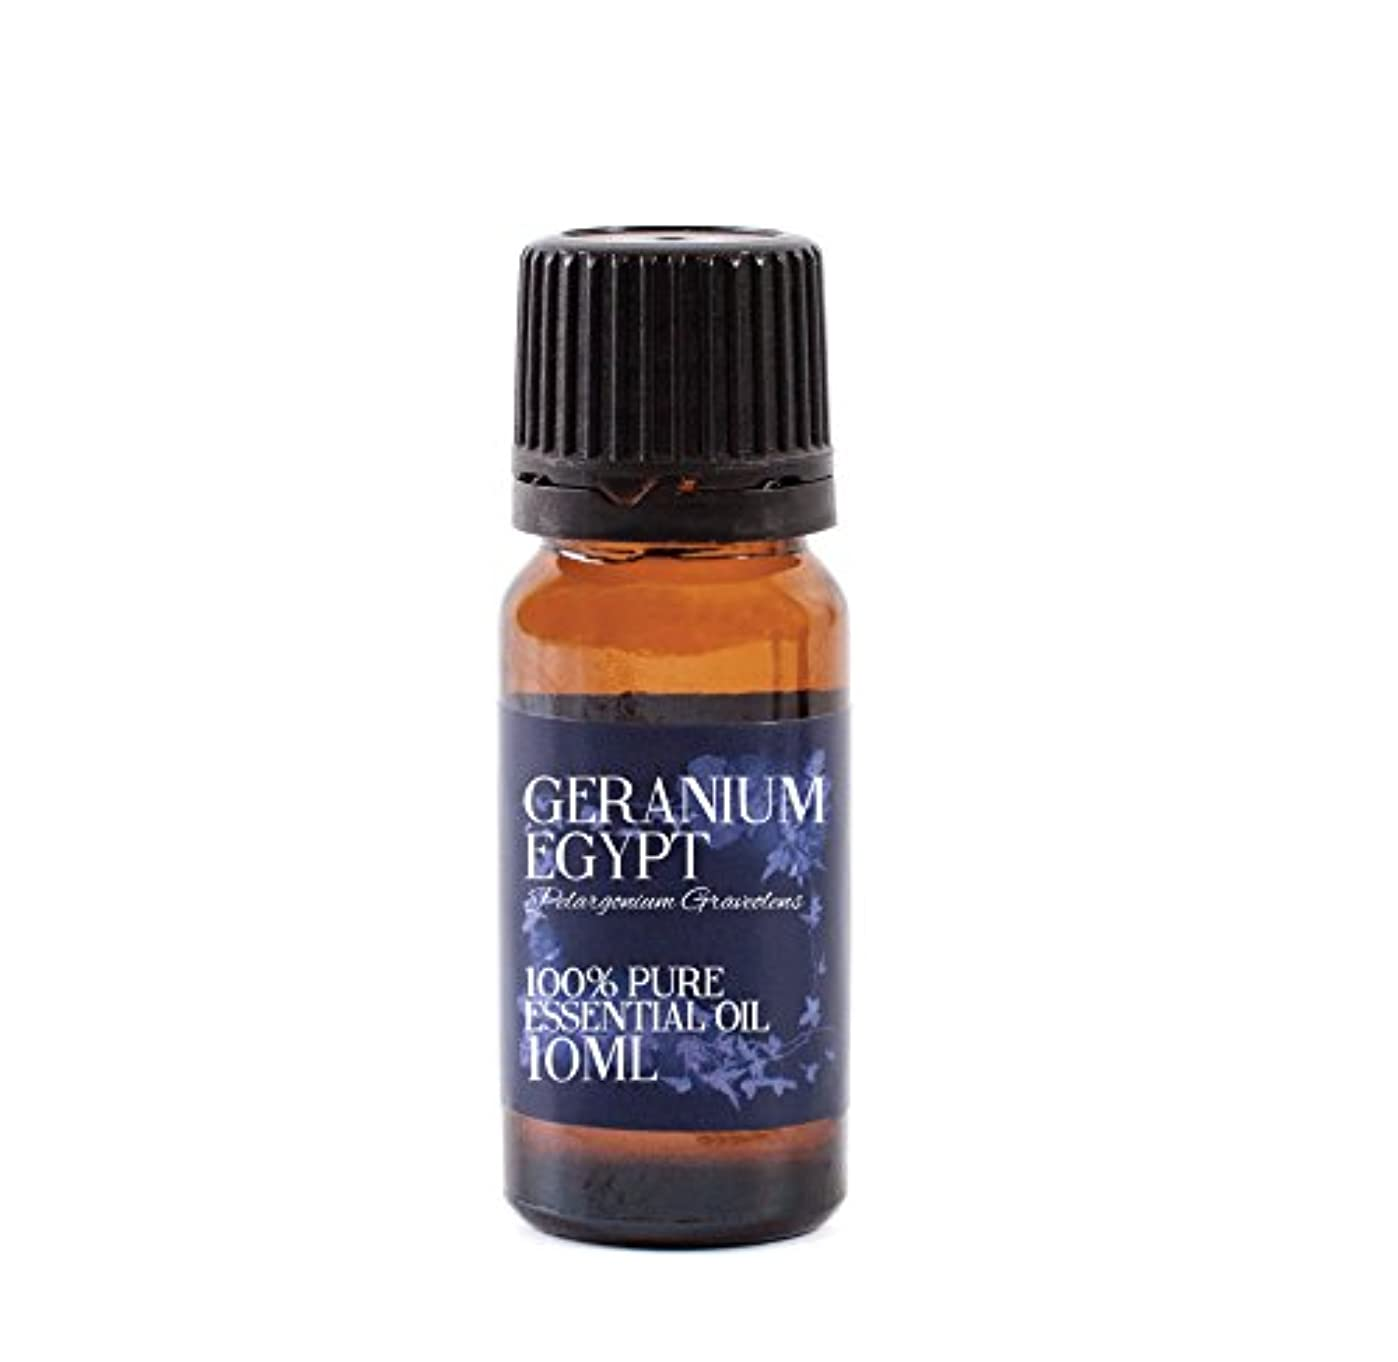 Mystic Moments | Geranium Egypt Essential Oil - 10ml - 100% Pure